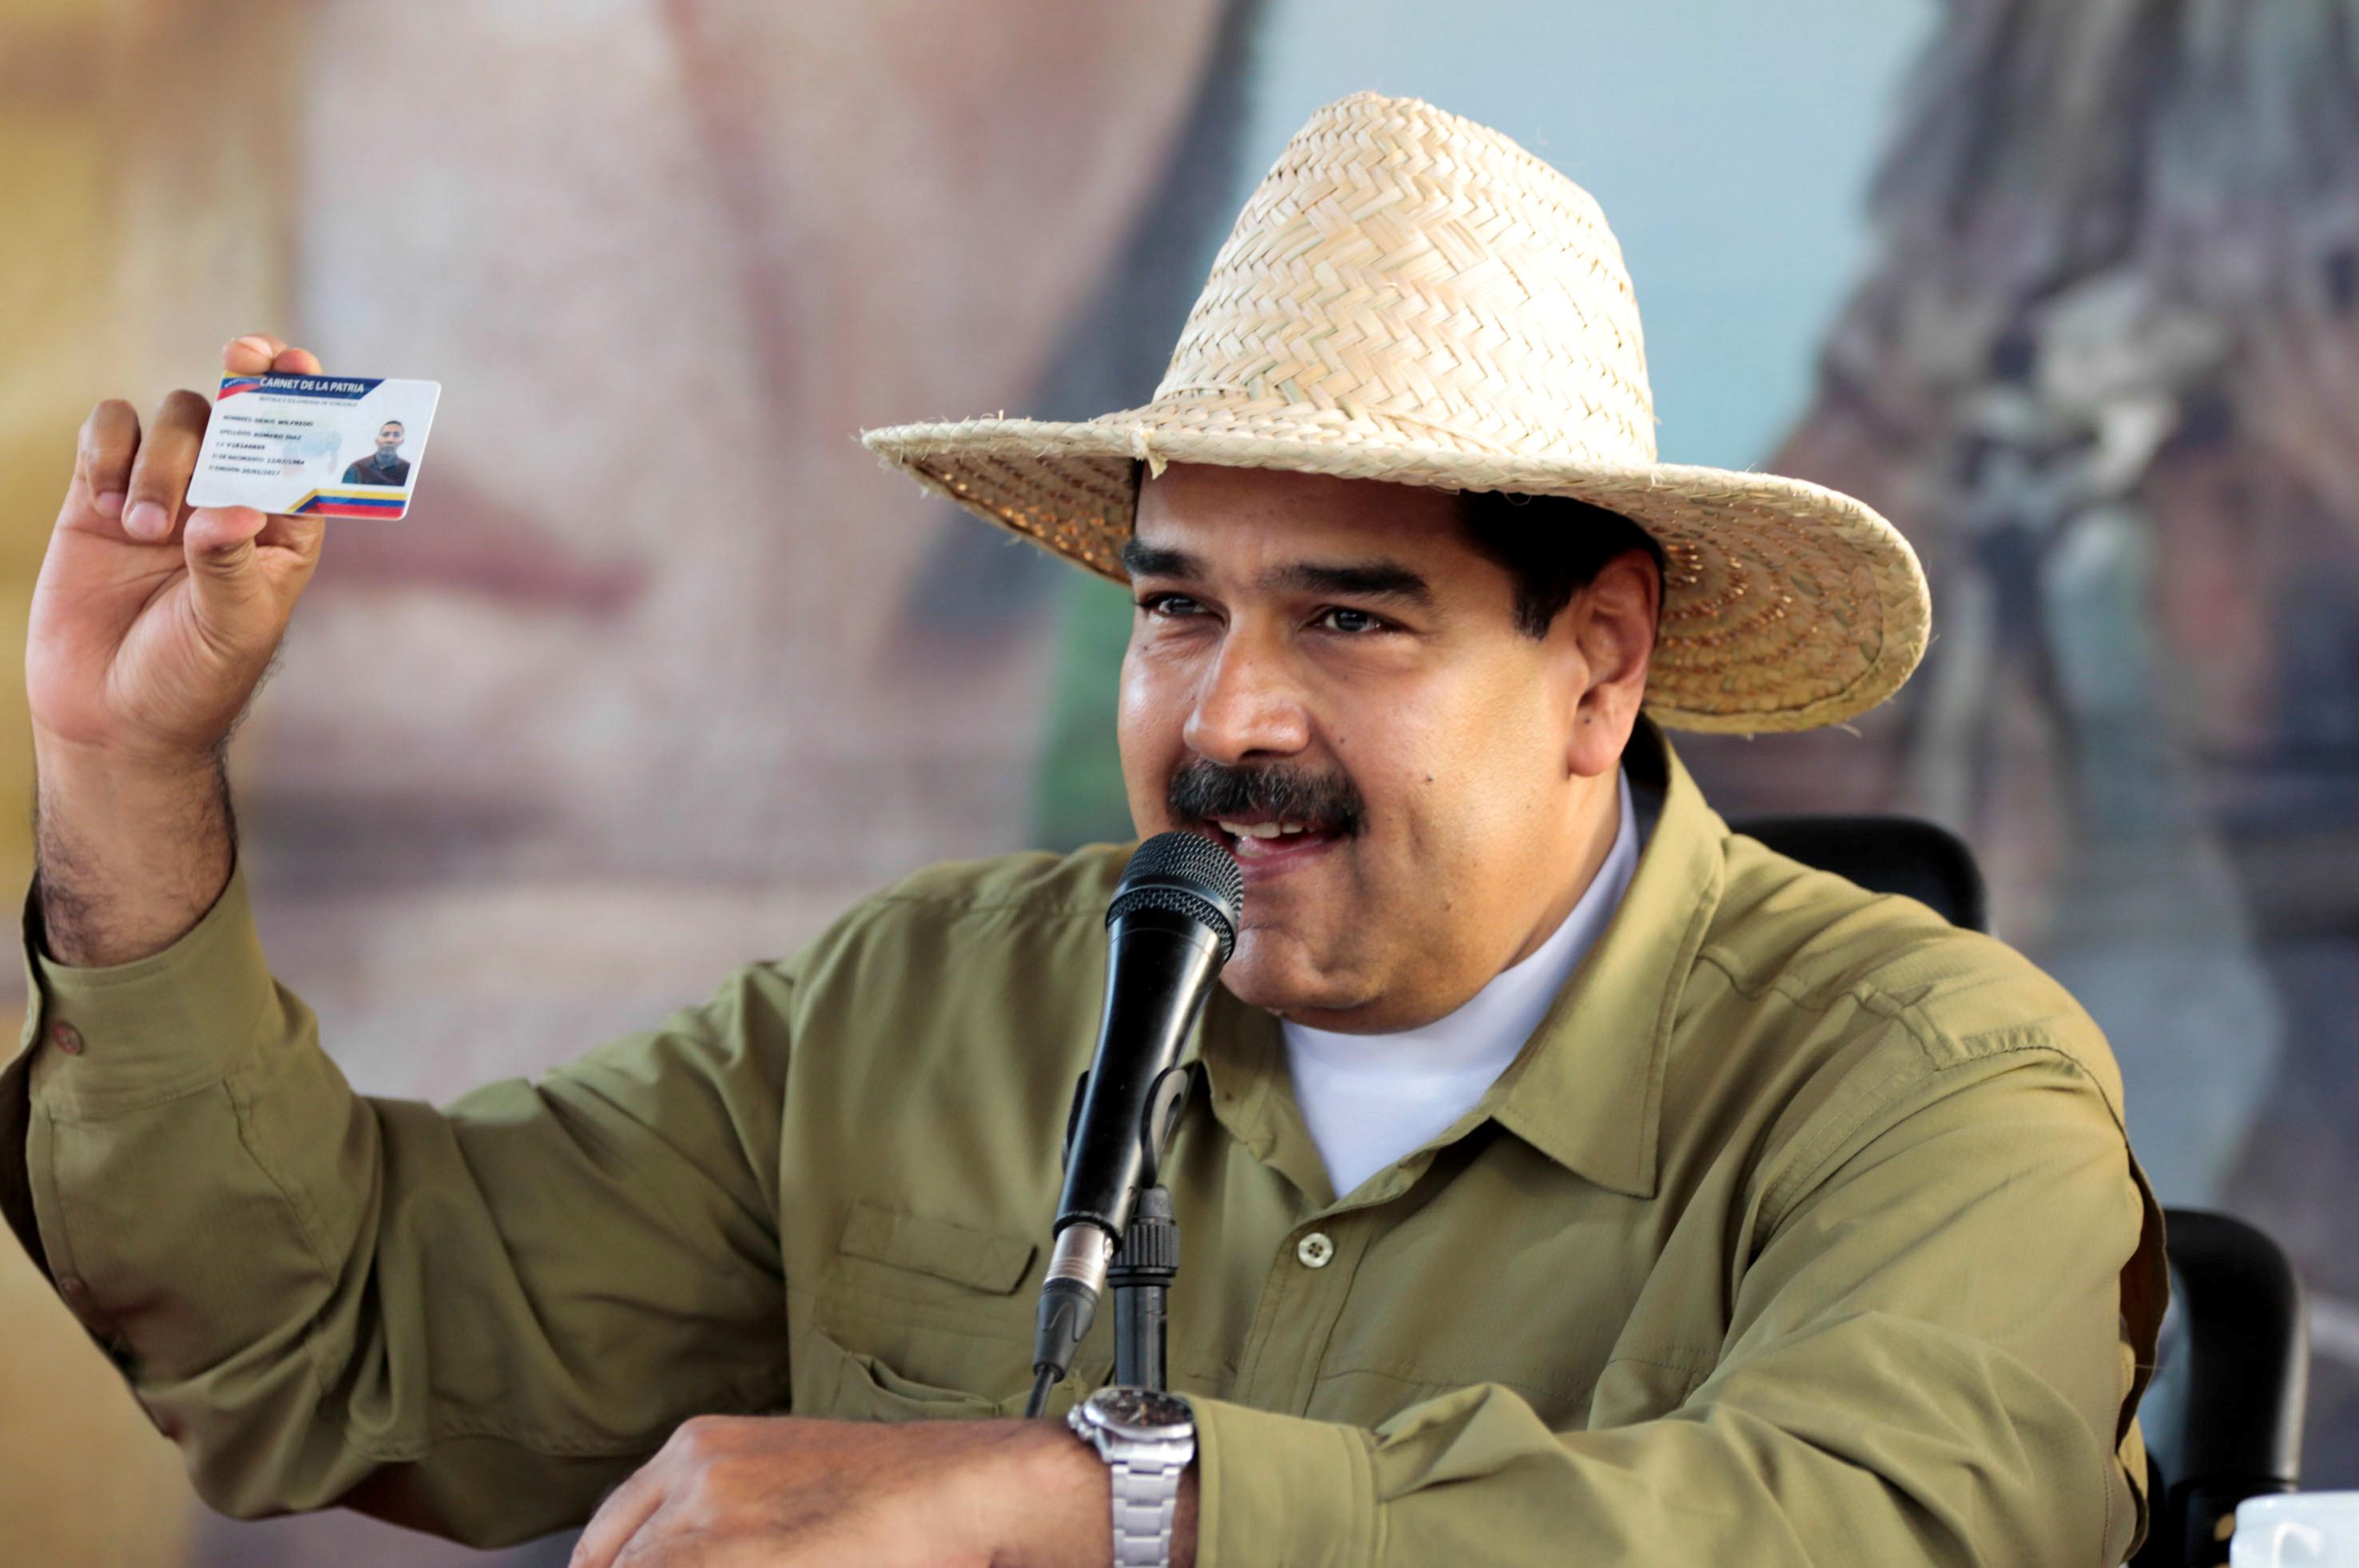 Venezuela's President Nicolas Maduro speaks during a meeting with supporters in Biruaca, Venezuela April 4, 2017. Miraflores Palace/Handout via REUTERS